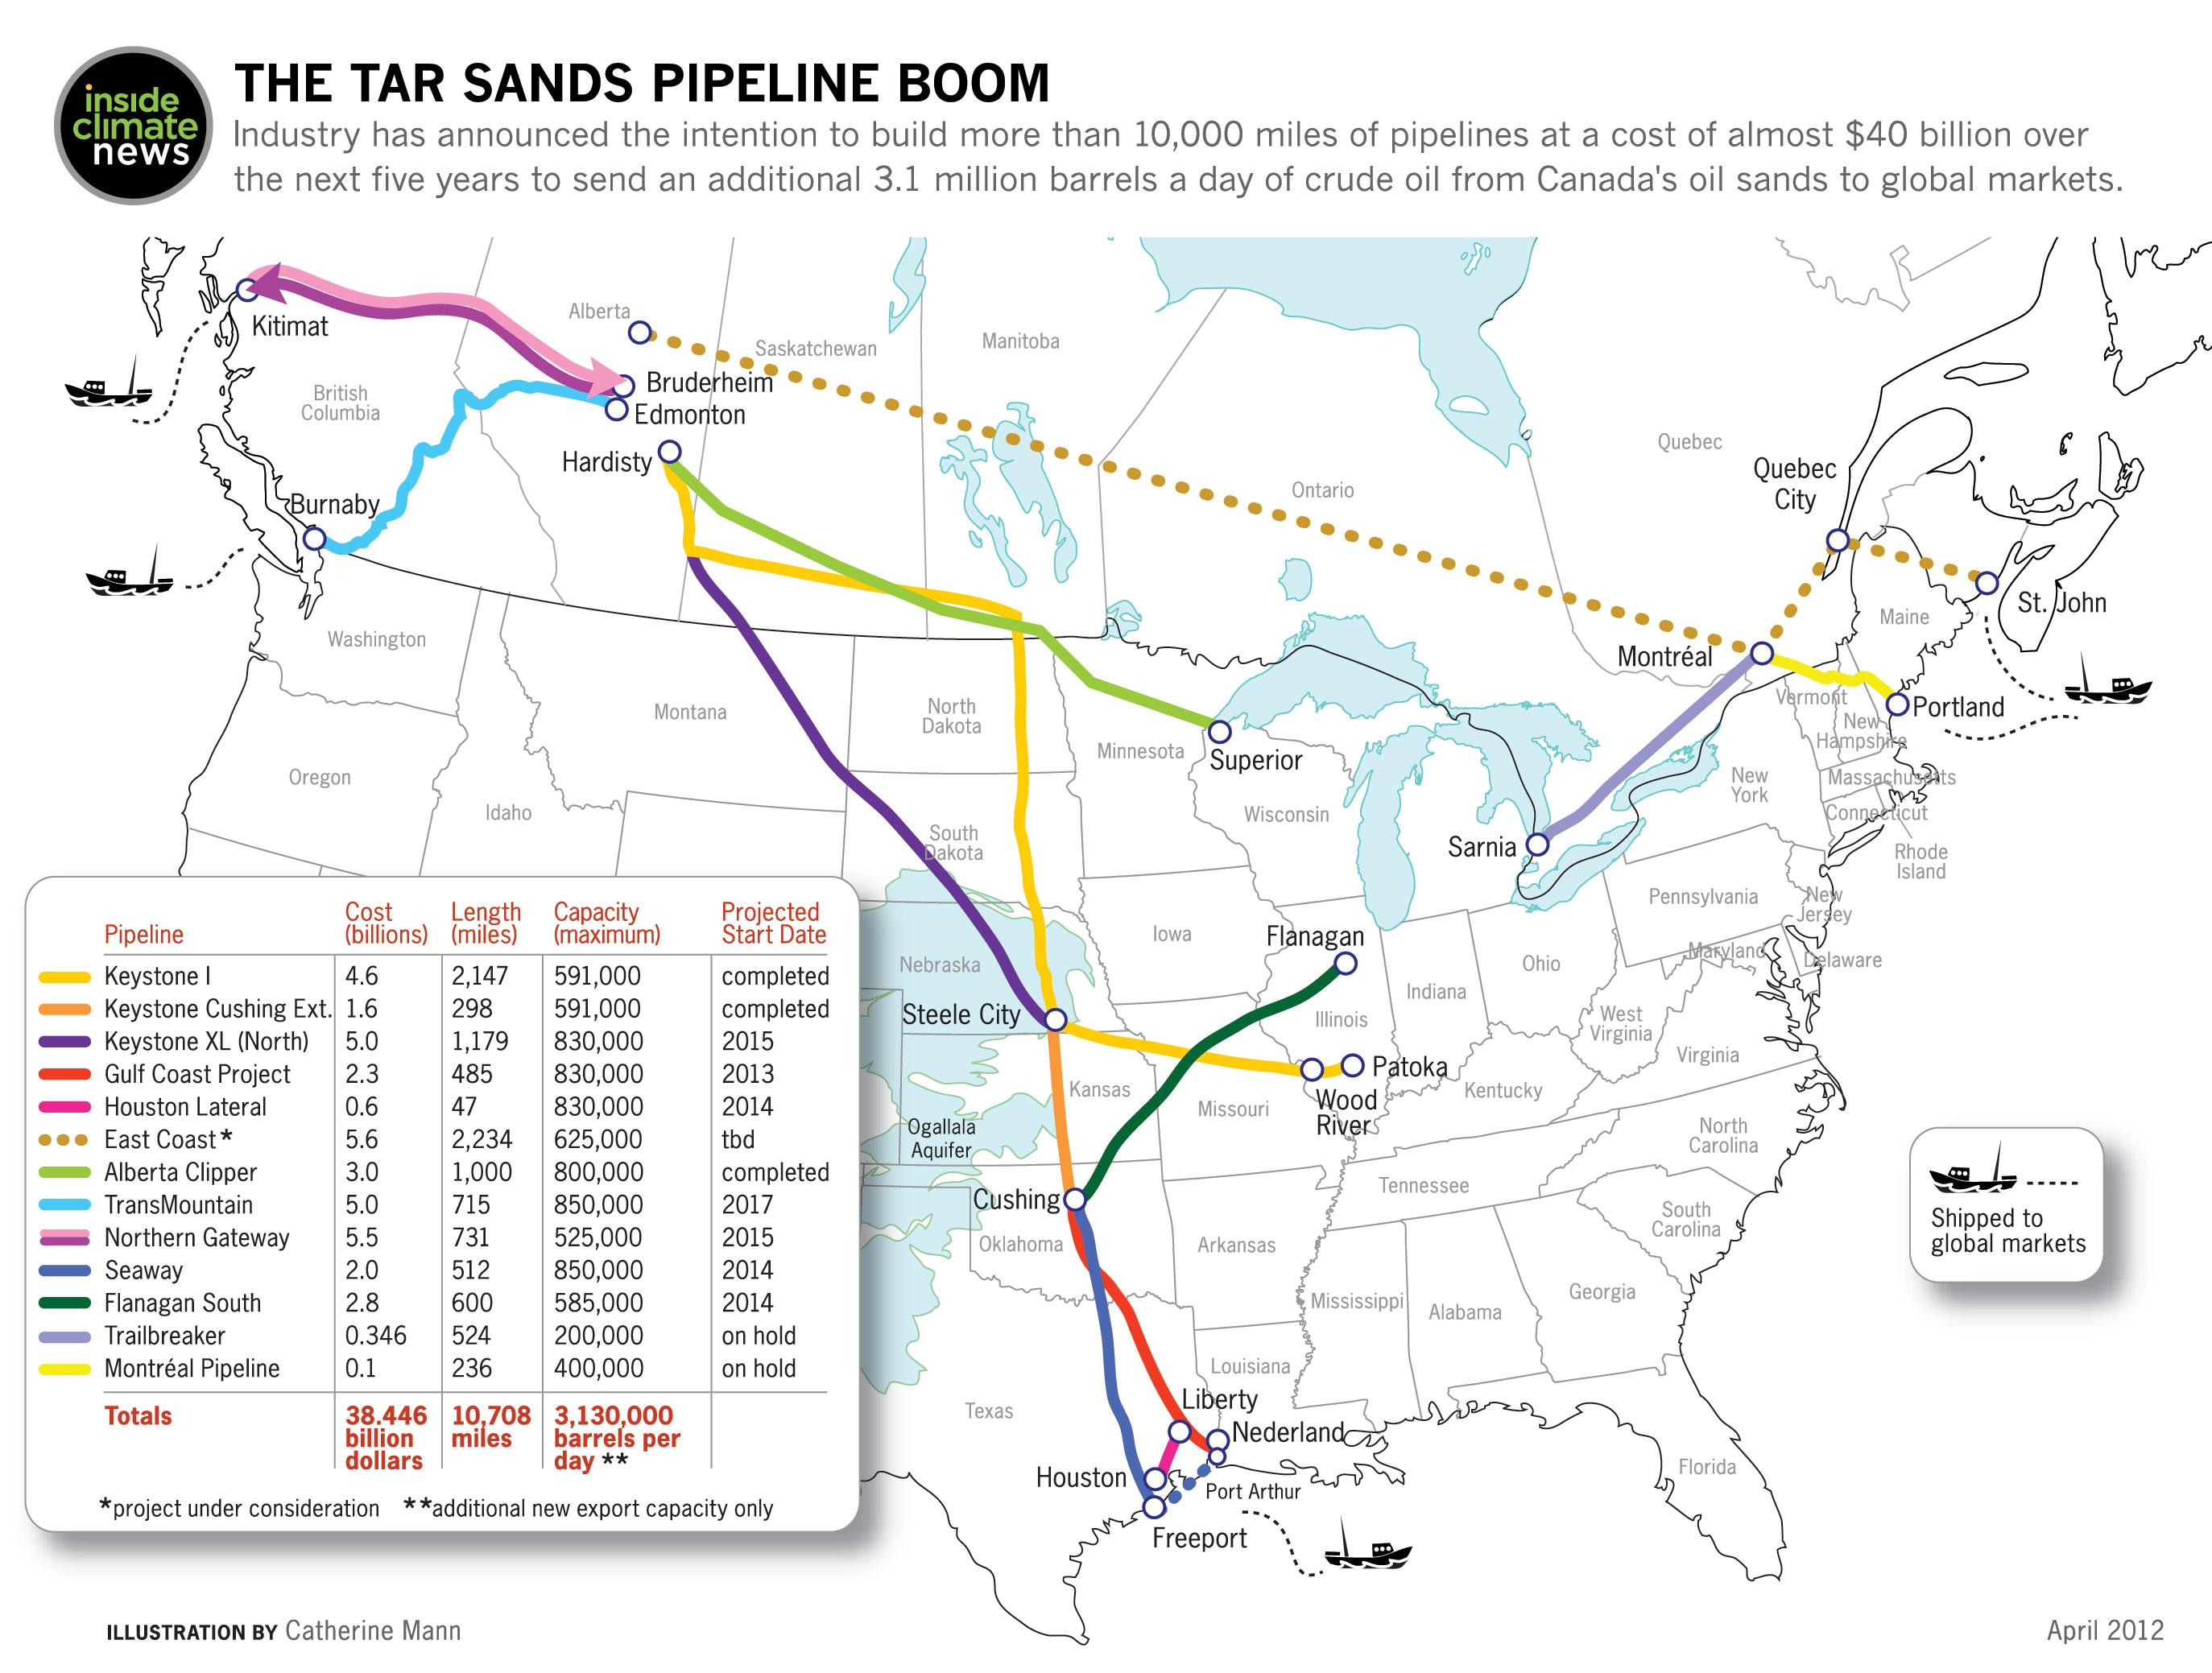 Transcanada Gets Final Ok For Last Leg Of Keystone Pipeline Down - Keystone Pipeline Map Texas